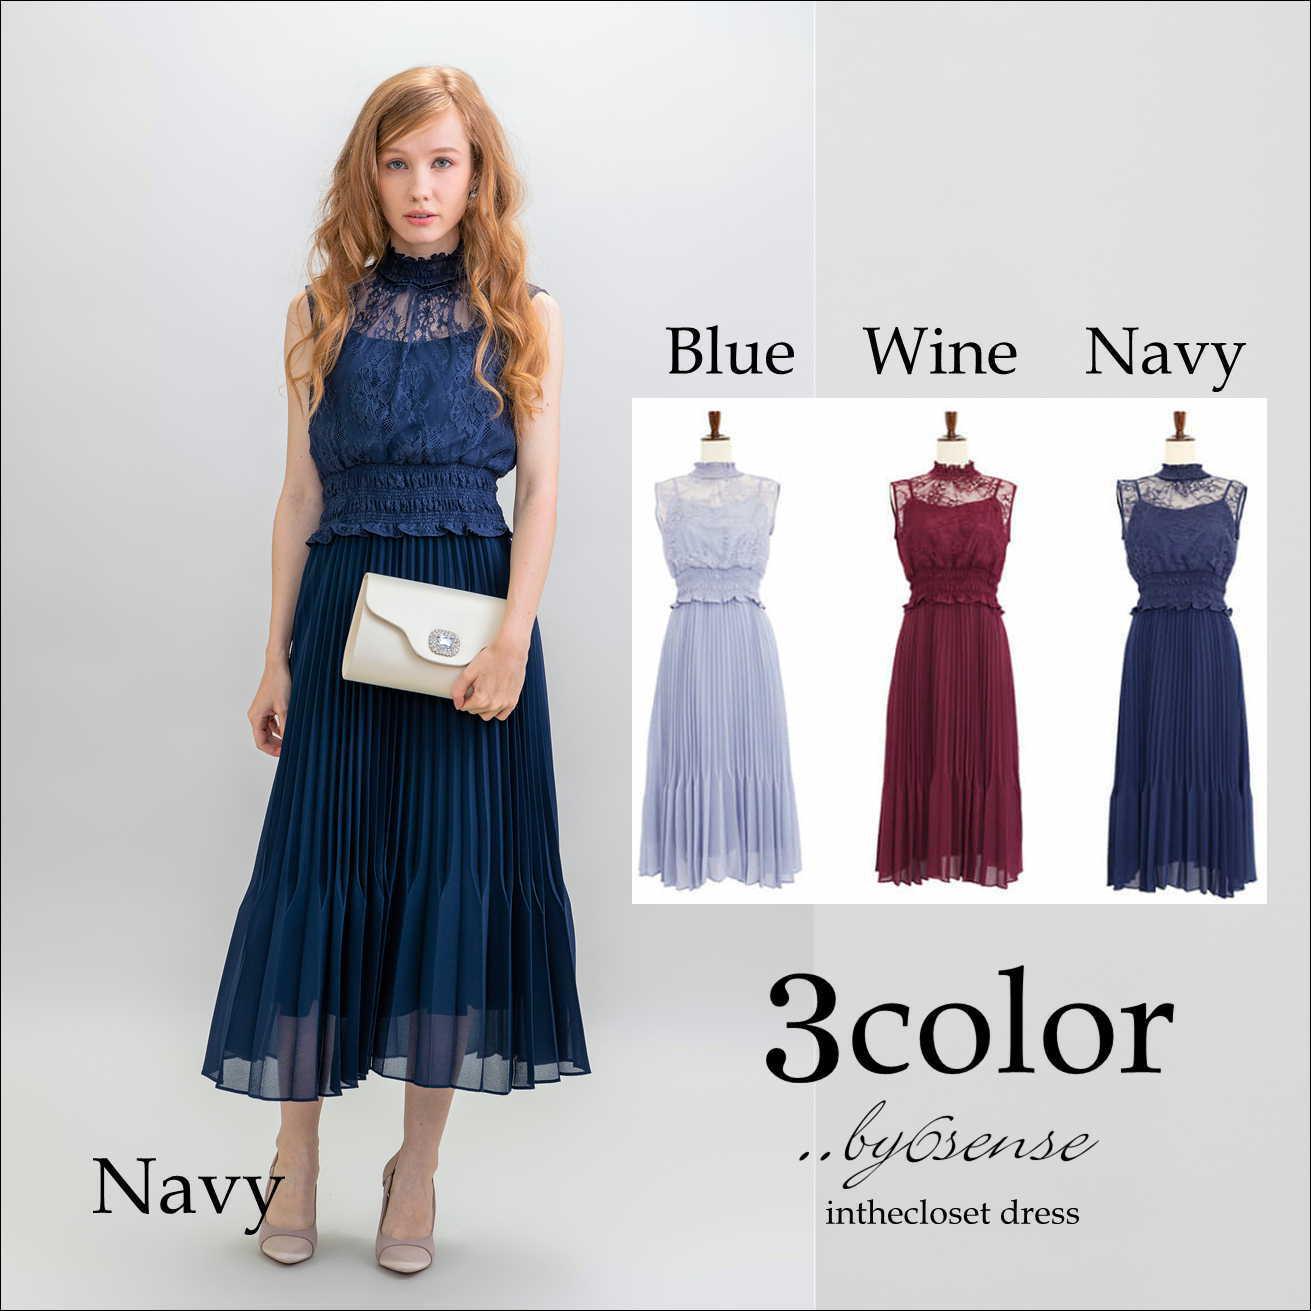 3color ハイネック・シャーリングギャザープリーツロングドレス・ワンピース